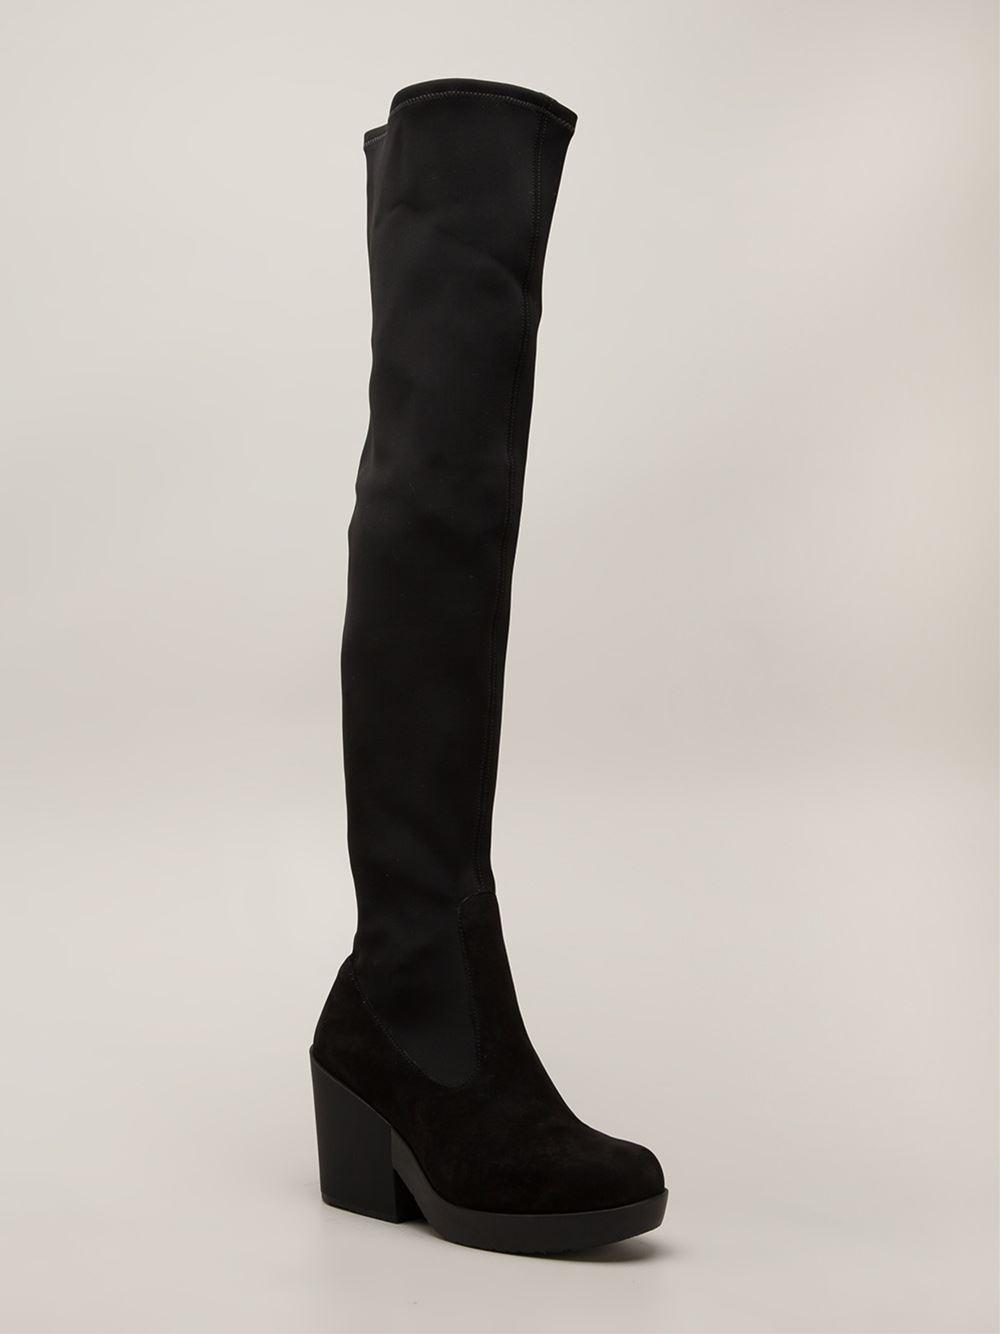 Camper Knee High Stretch Boots in Black | Lyst